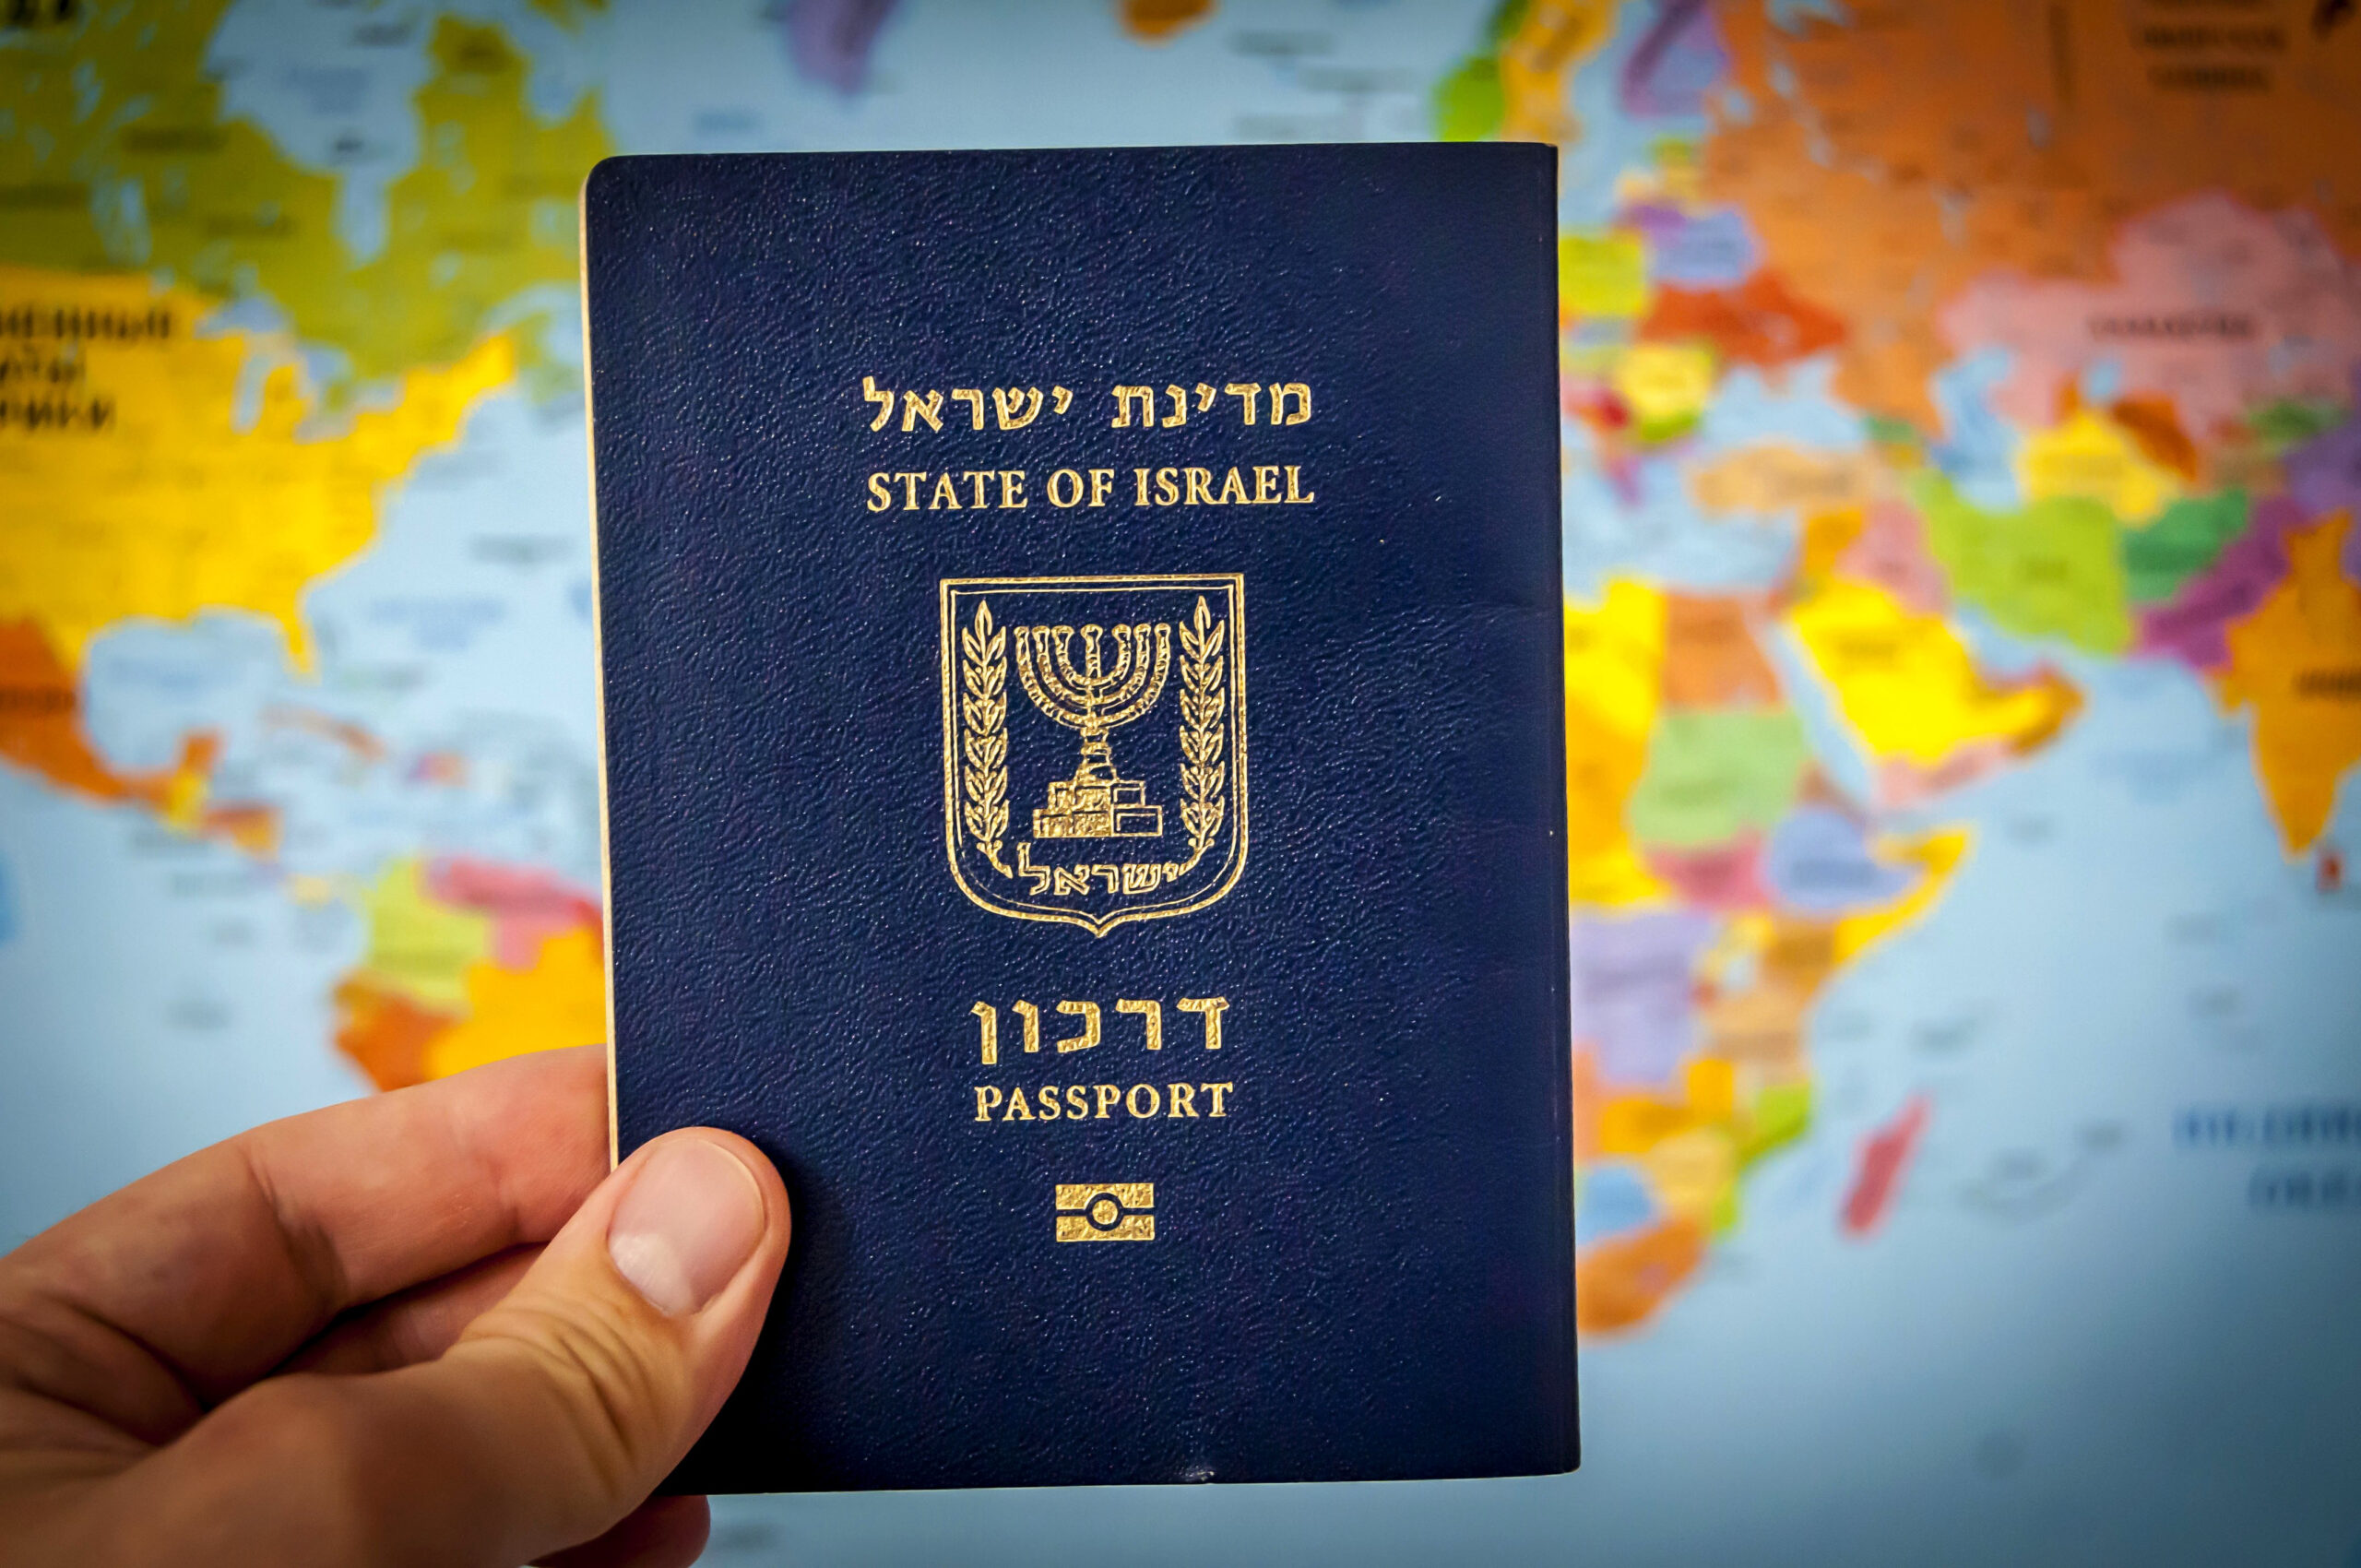 Israeli Passport Image